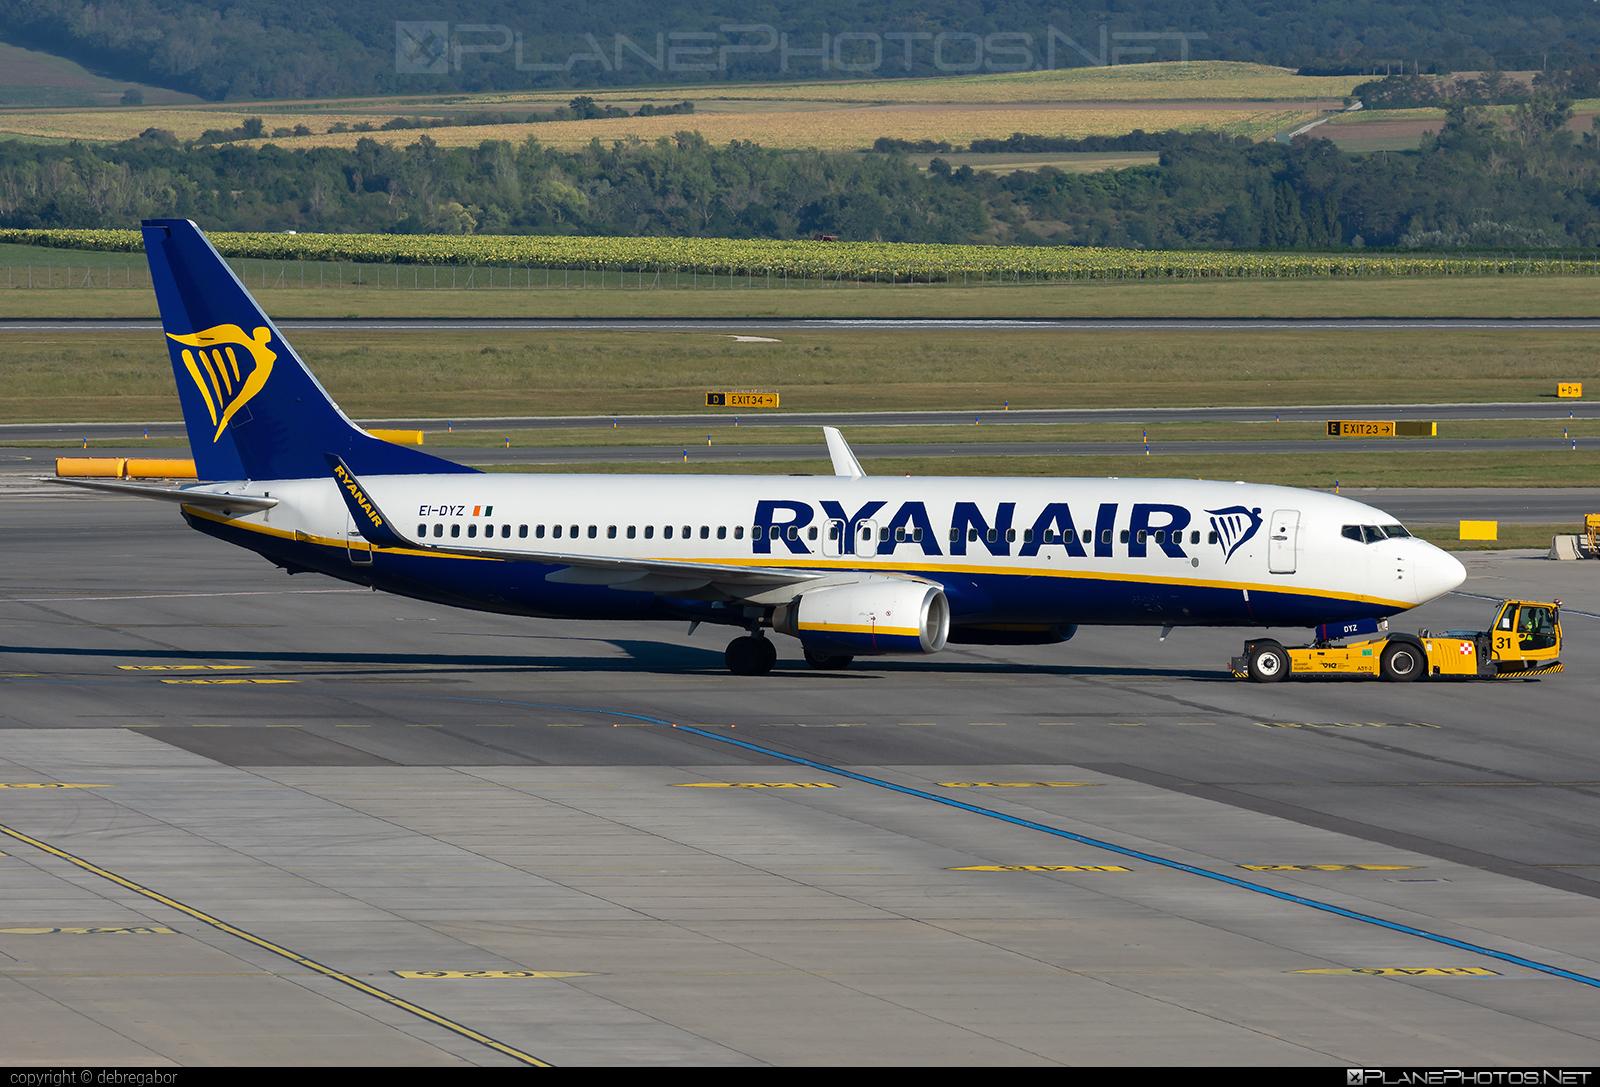 Boeing 737-800 - EI-DYZ operated by Ryanair #b737 #b737nextgen #b737ng #boeing #boeing737 #ryanair